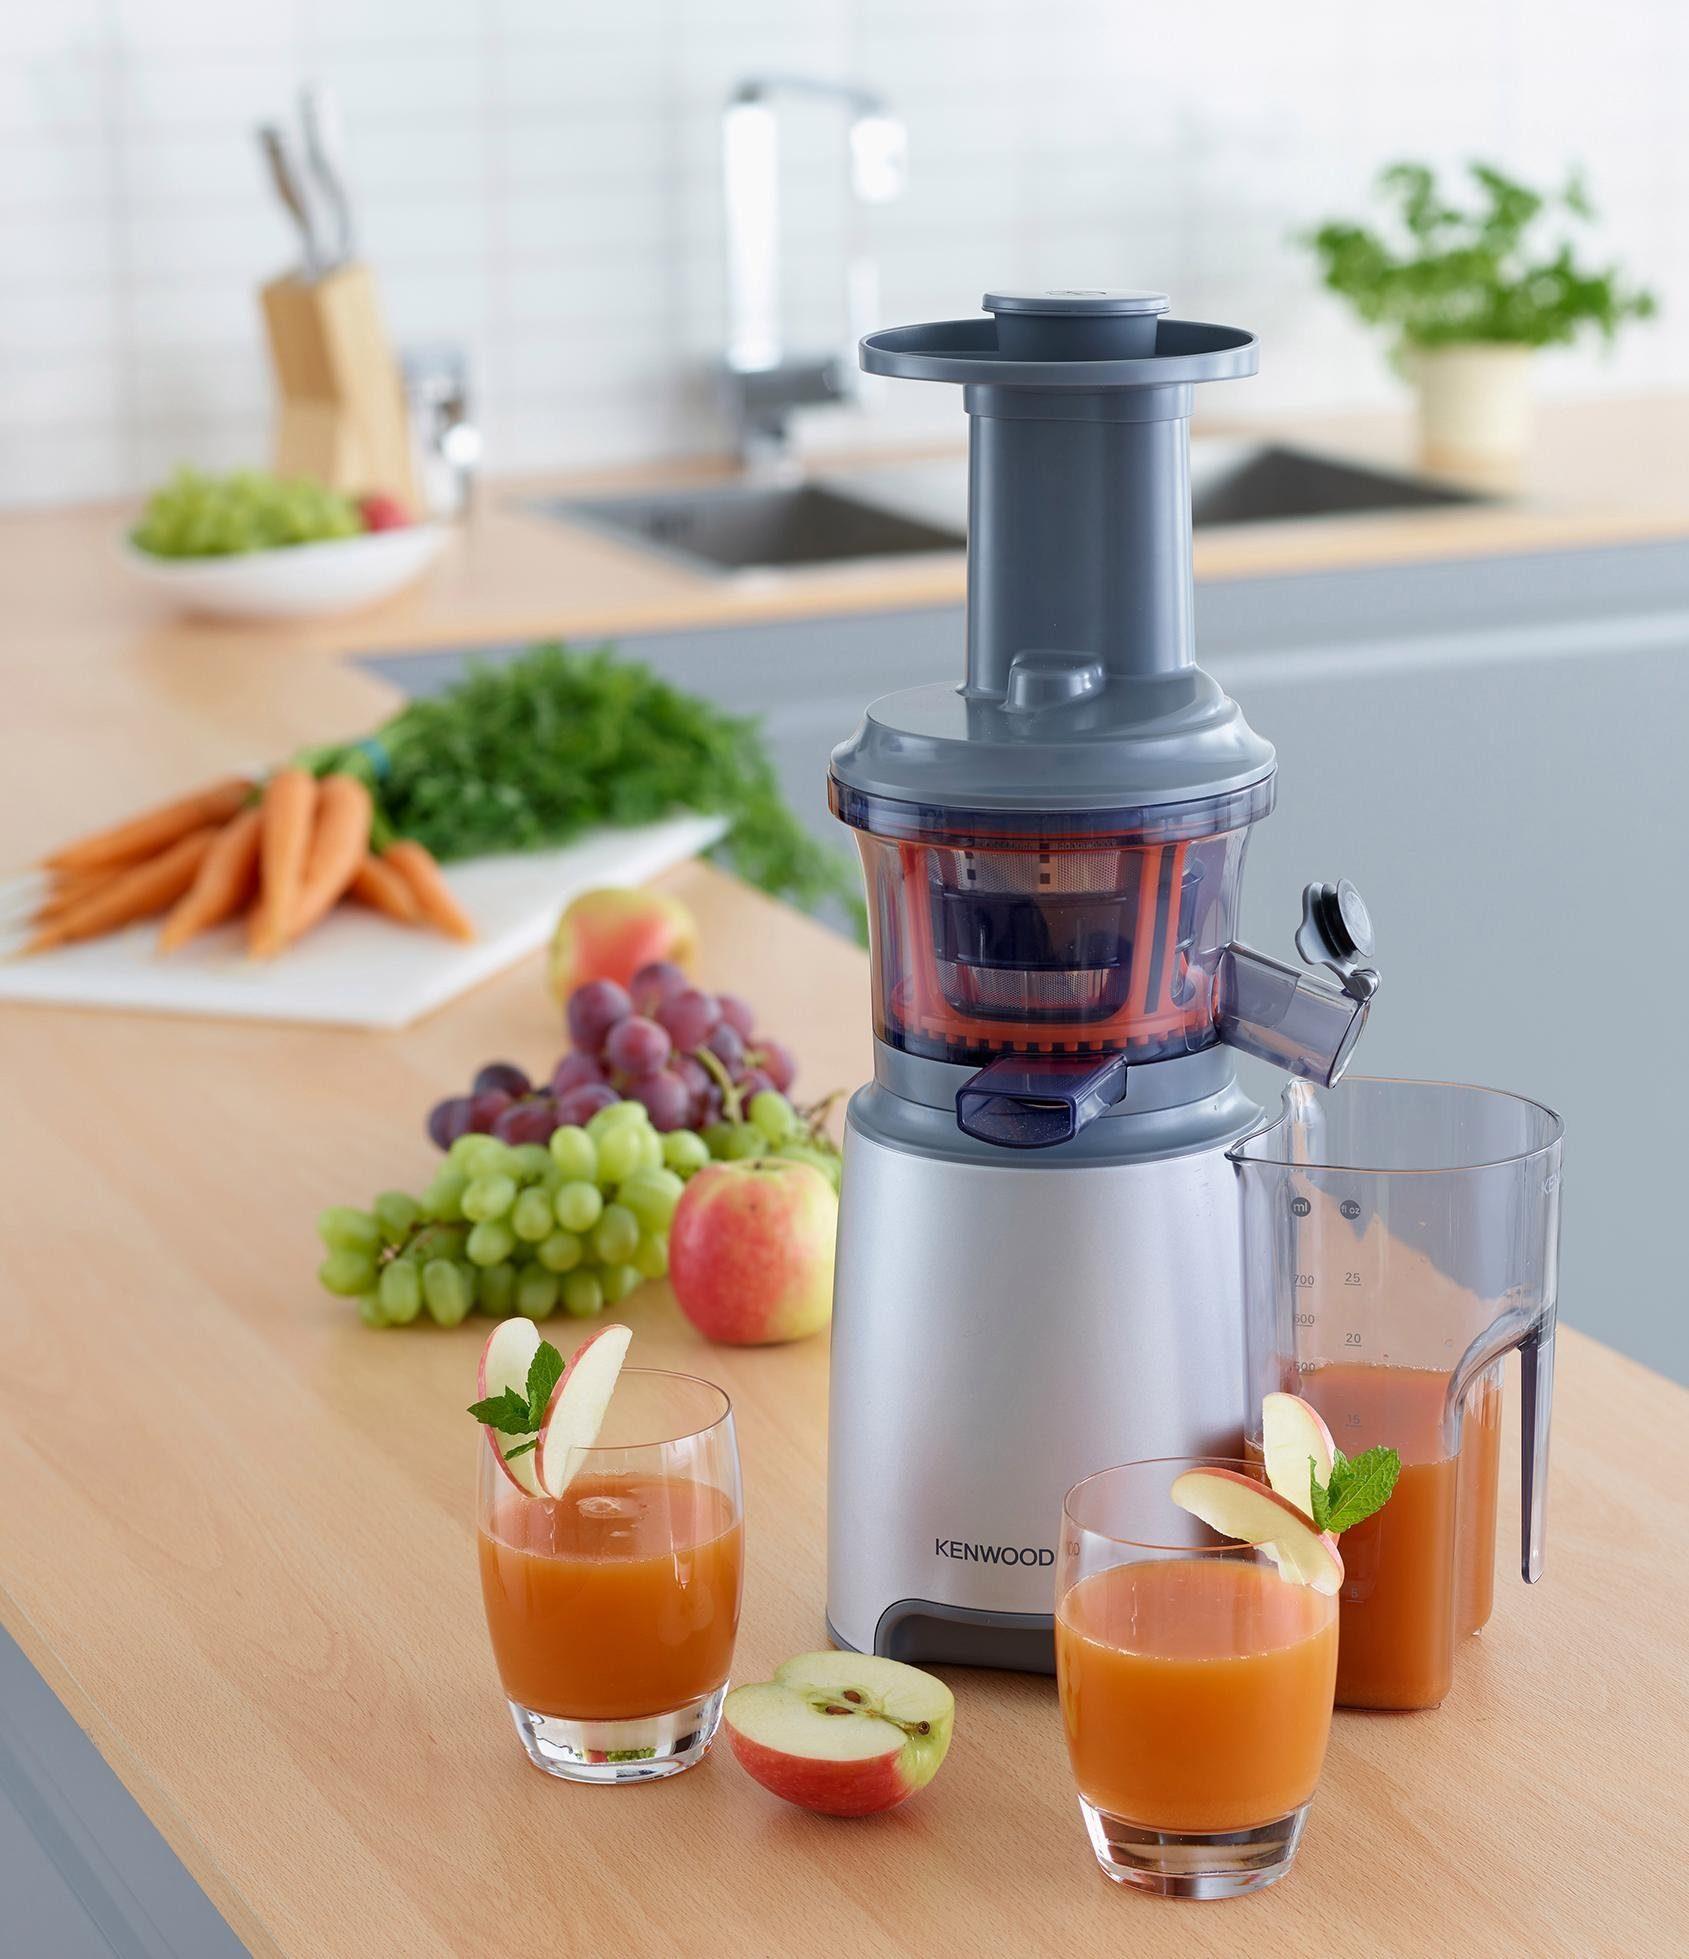 KENWOOD Slow Juicer JMP 600 SI, 150 W, 150 Watt